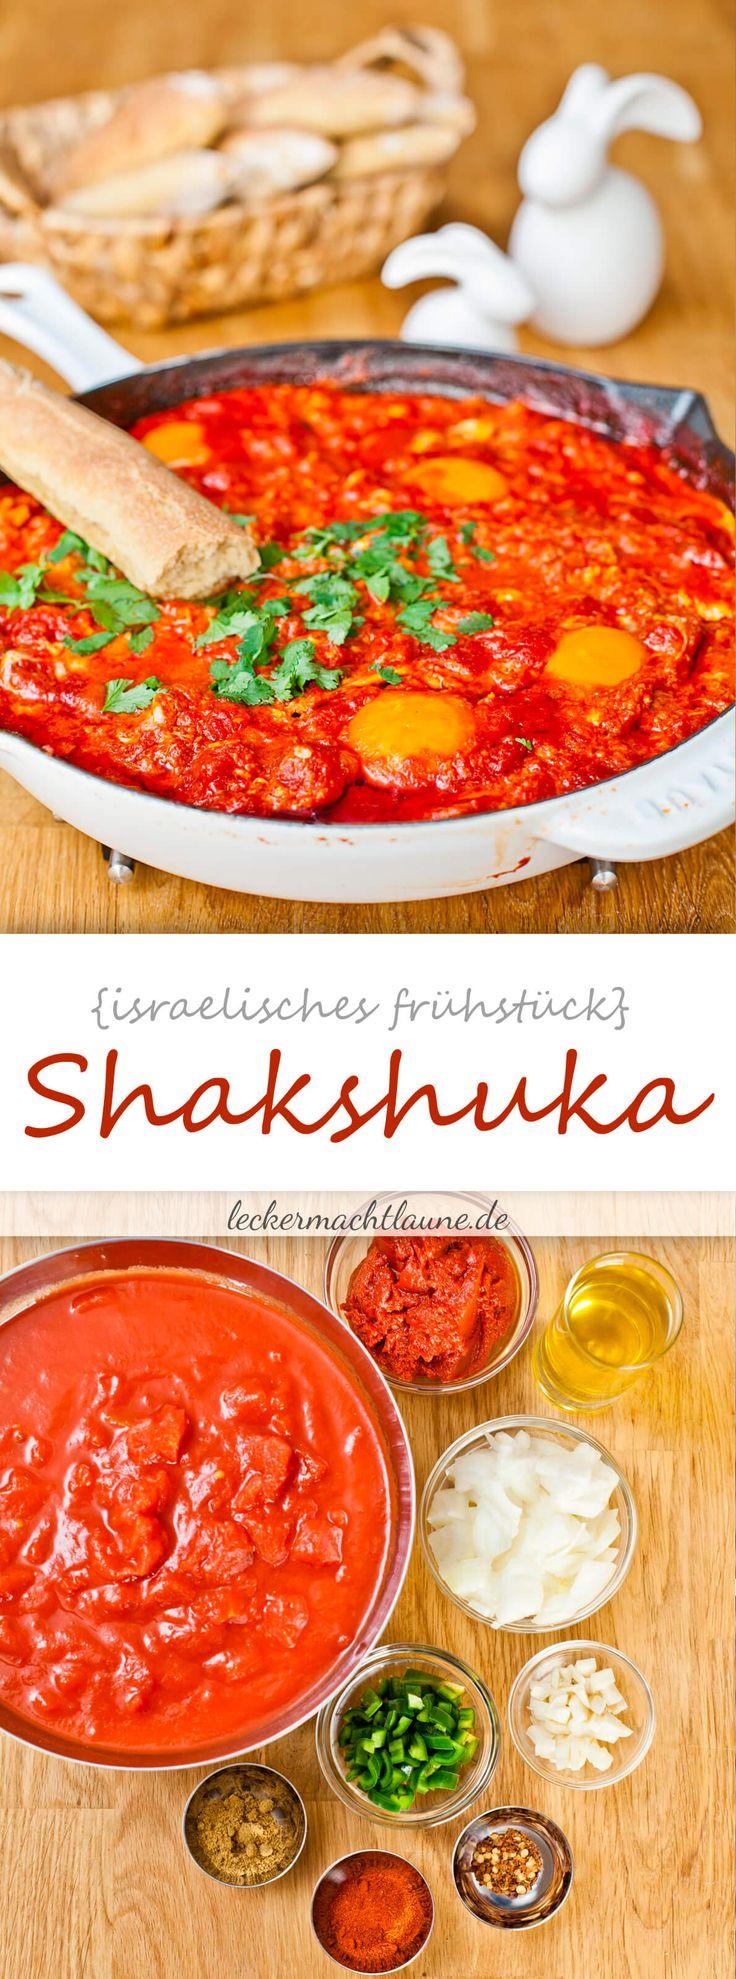 Shakshuka – Shakshouka {israelisches frühstück}